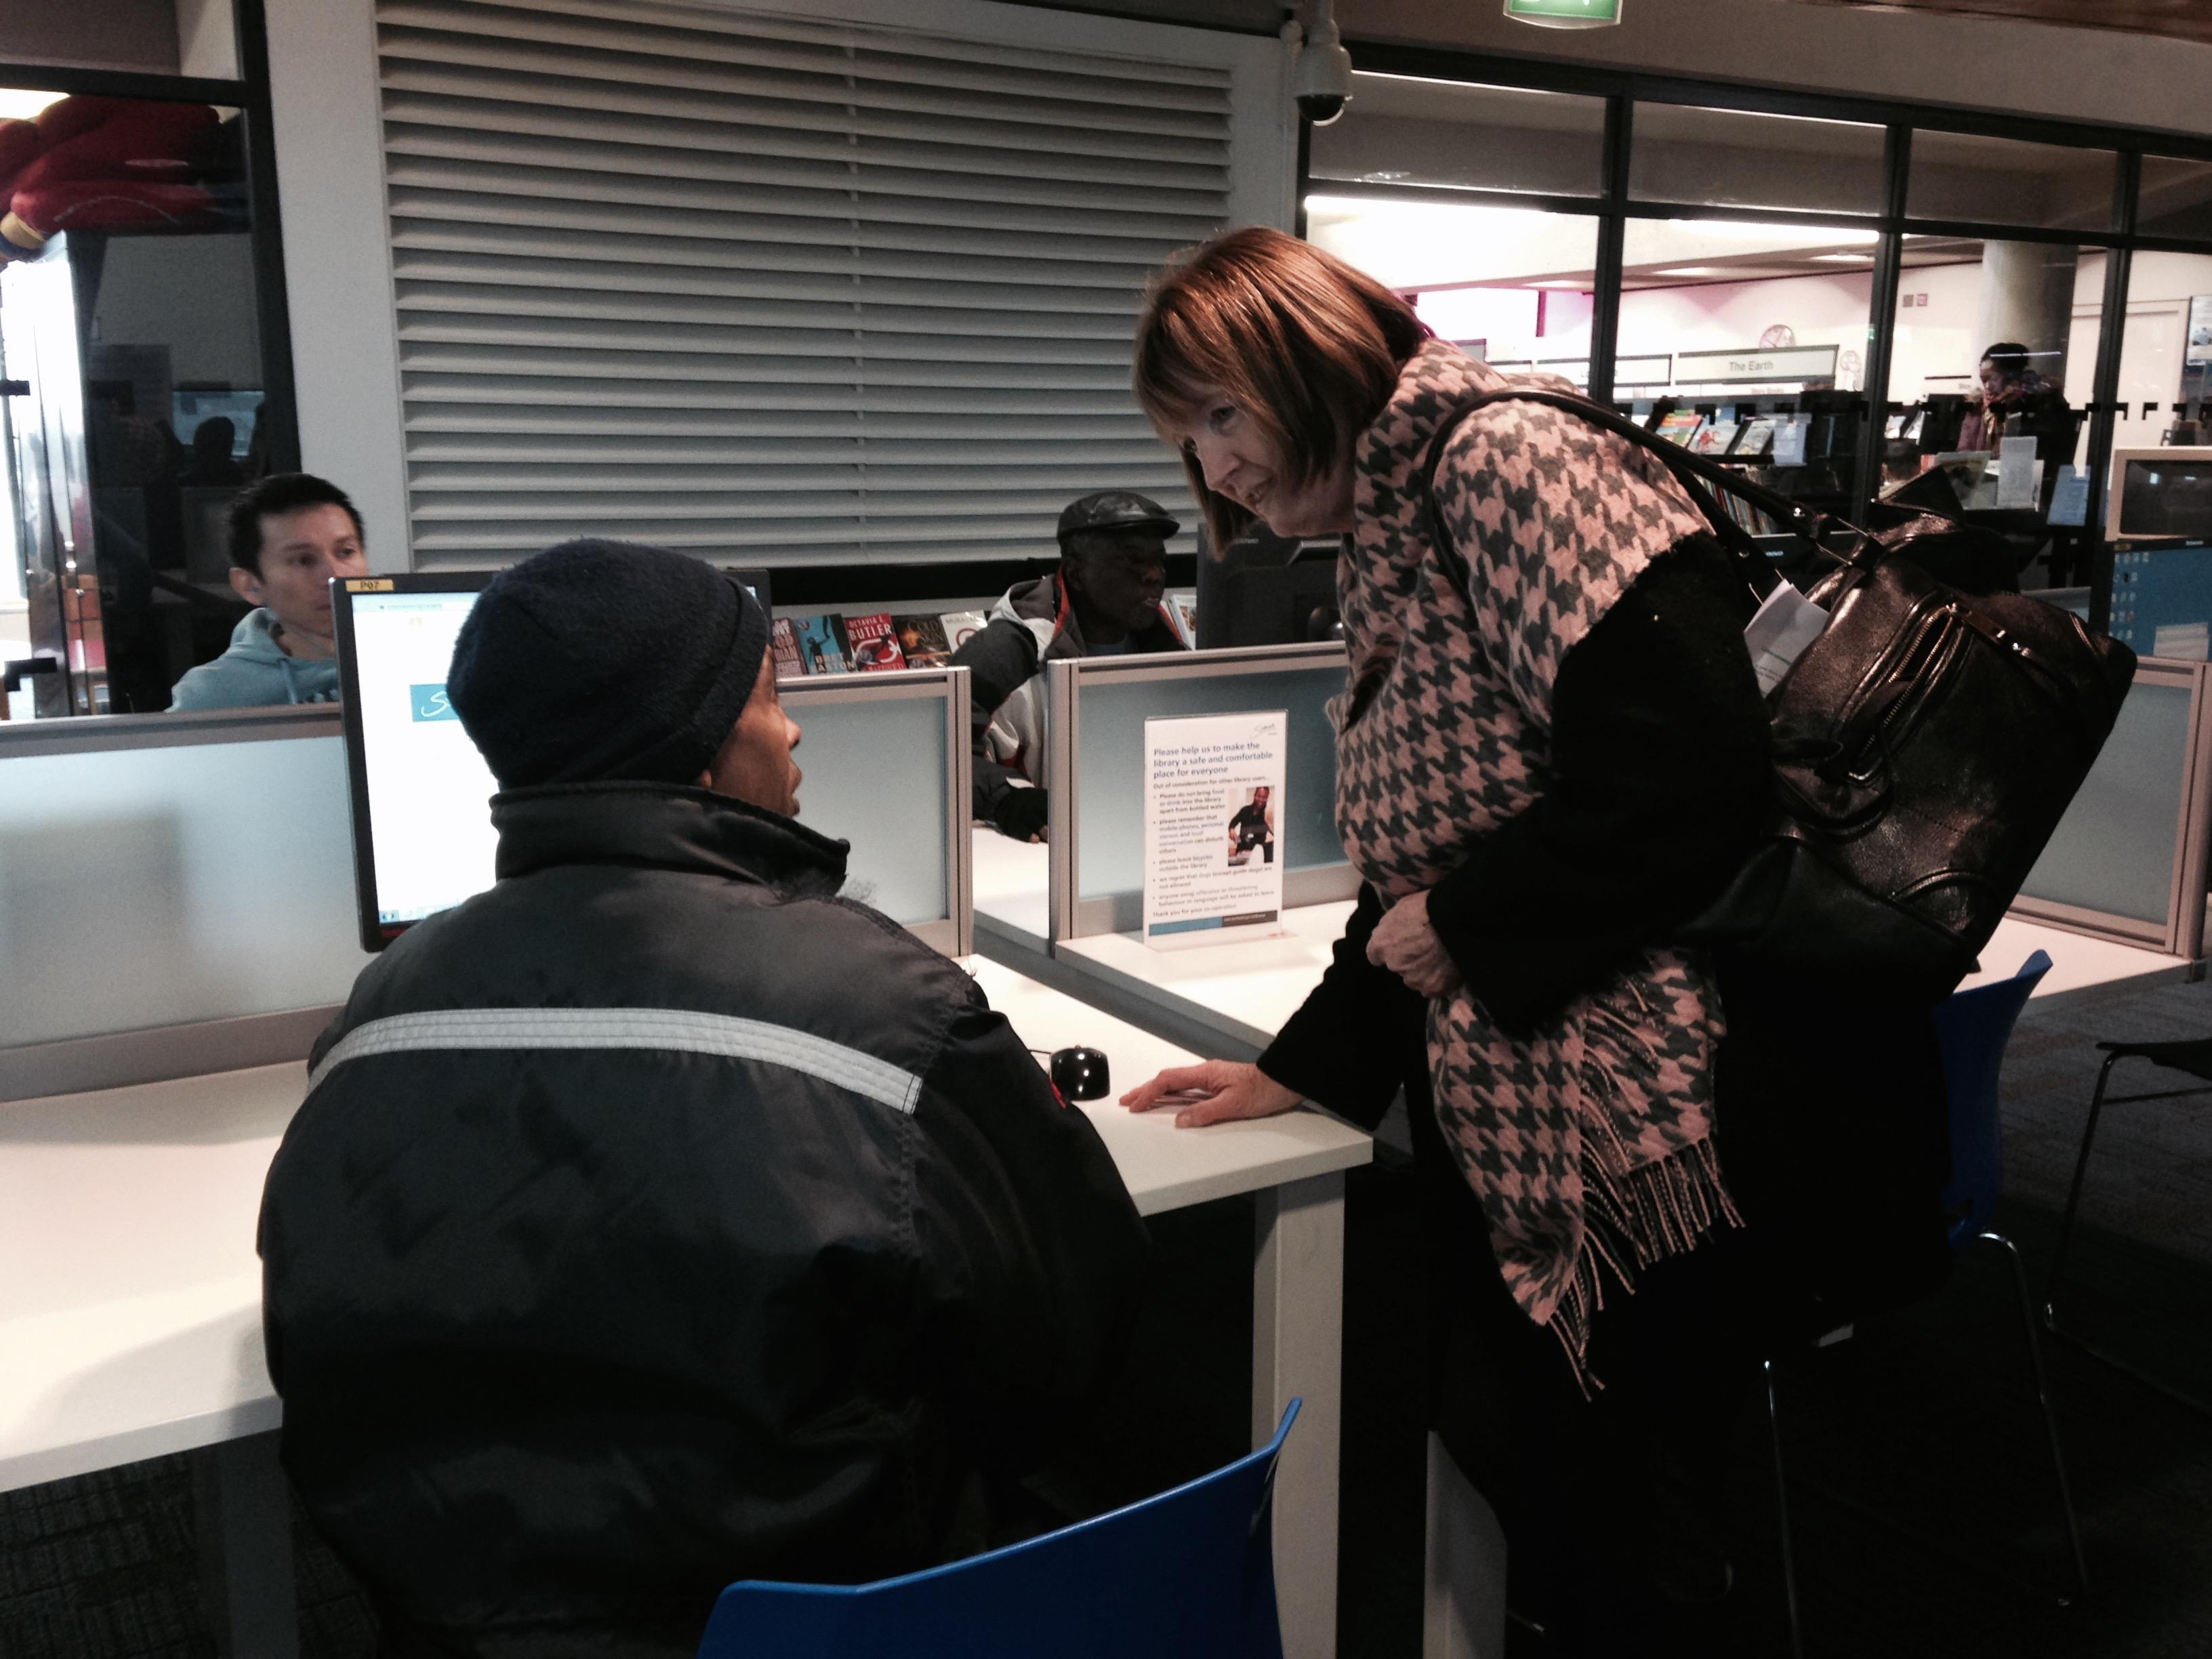 Peckham_Library5_5.2.15.jpg